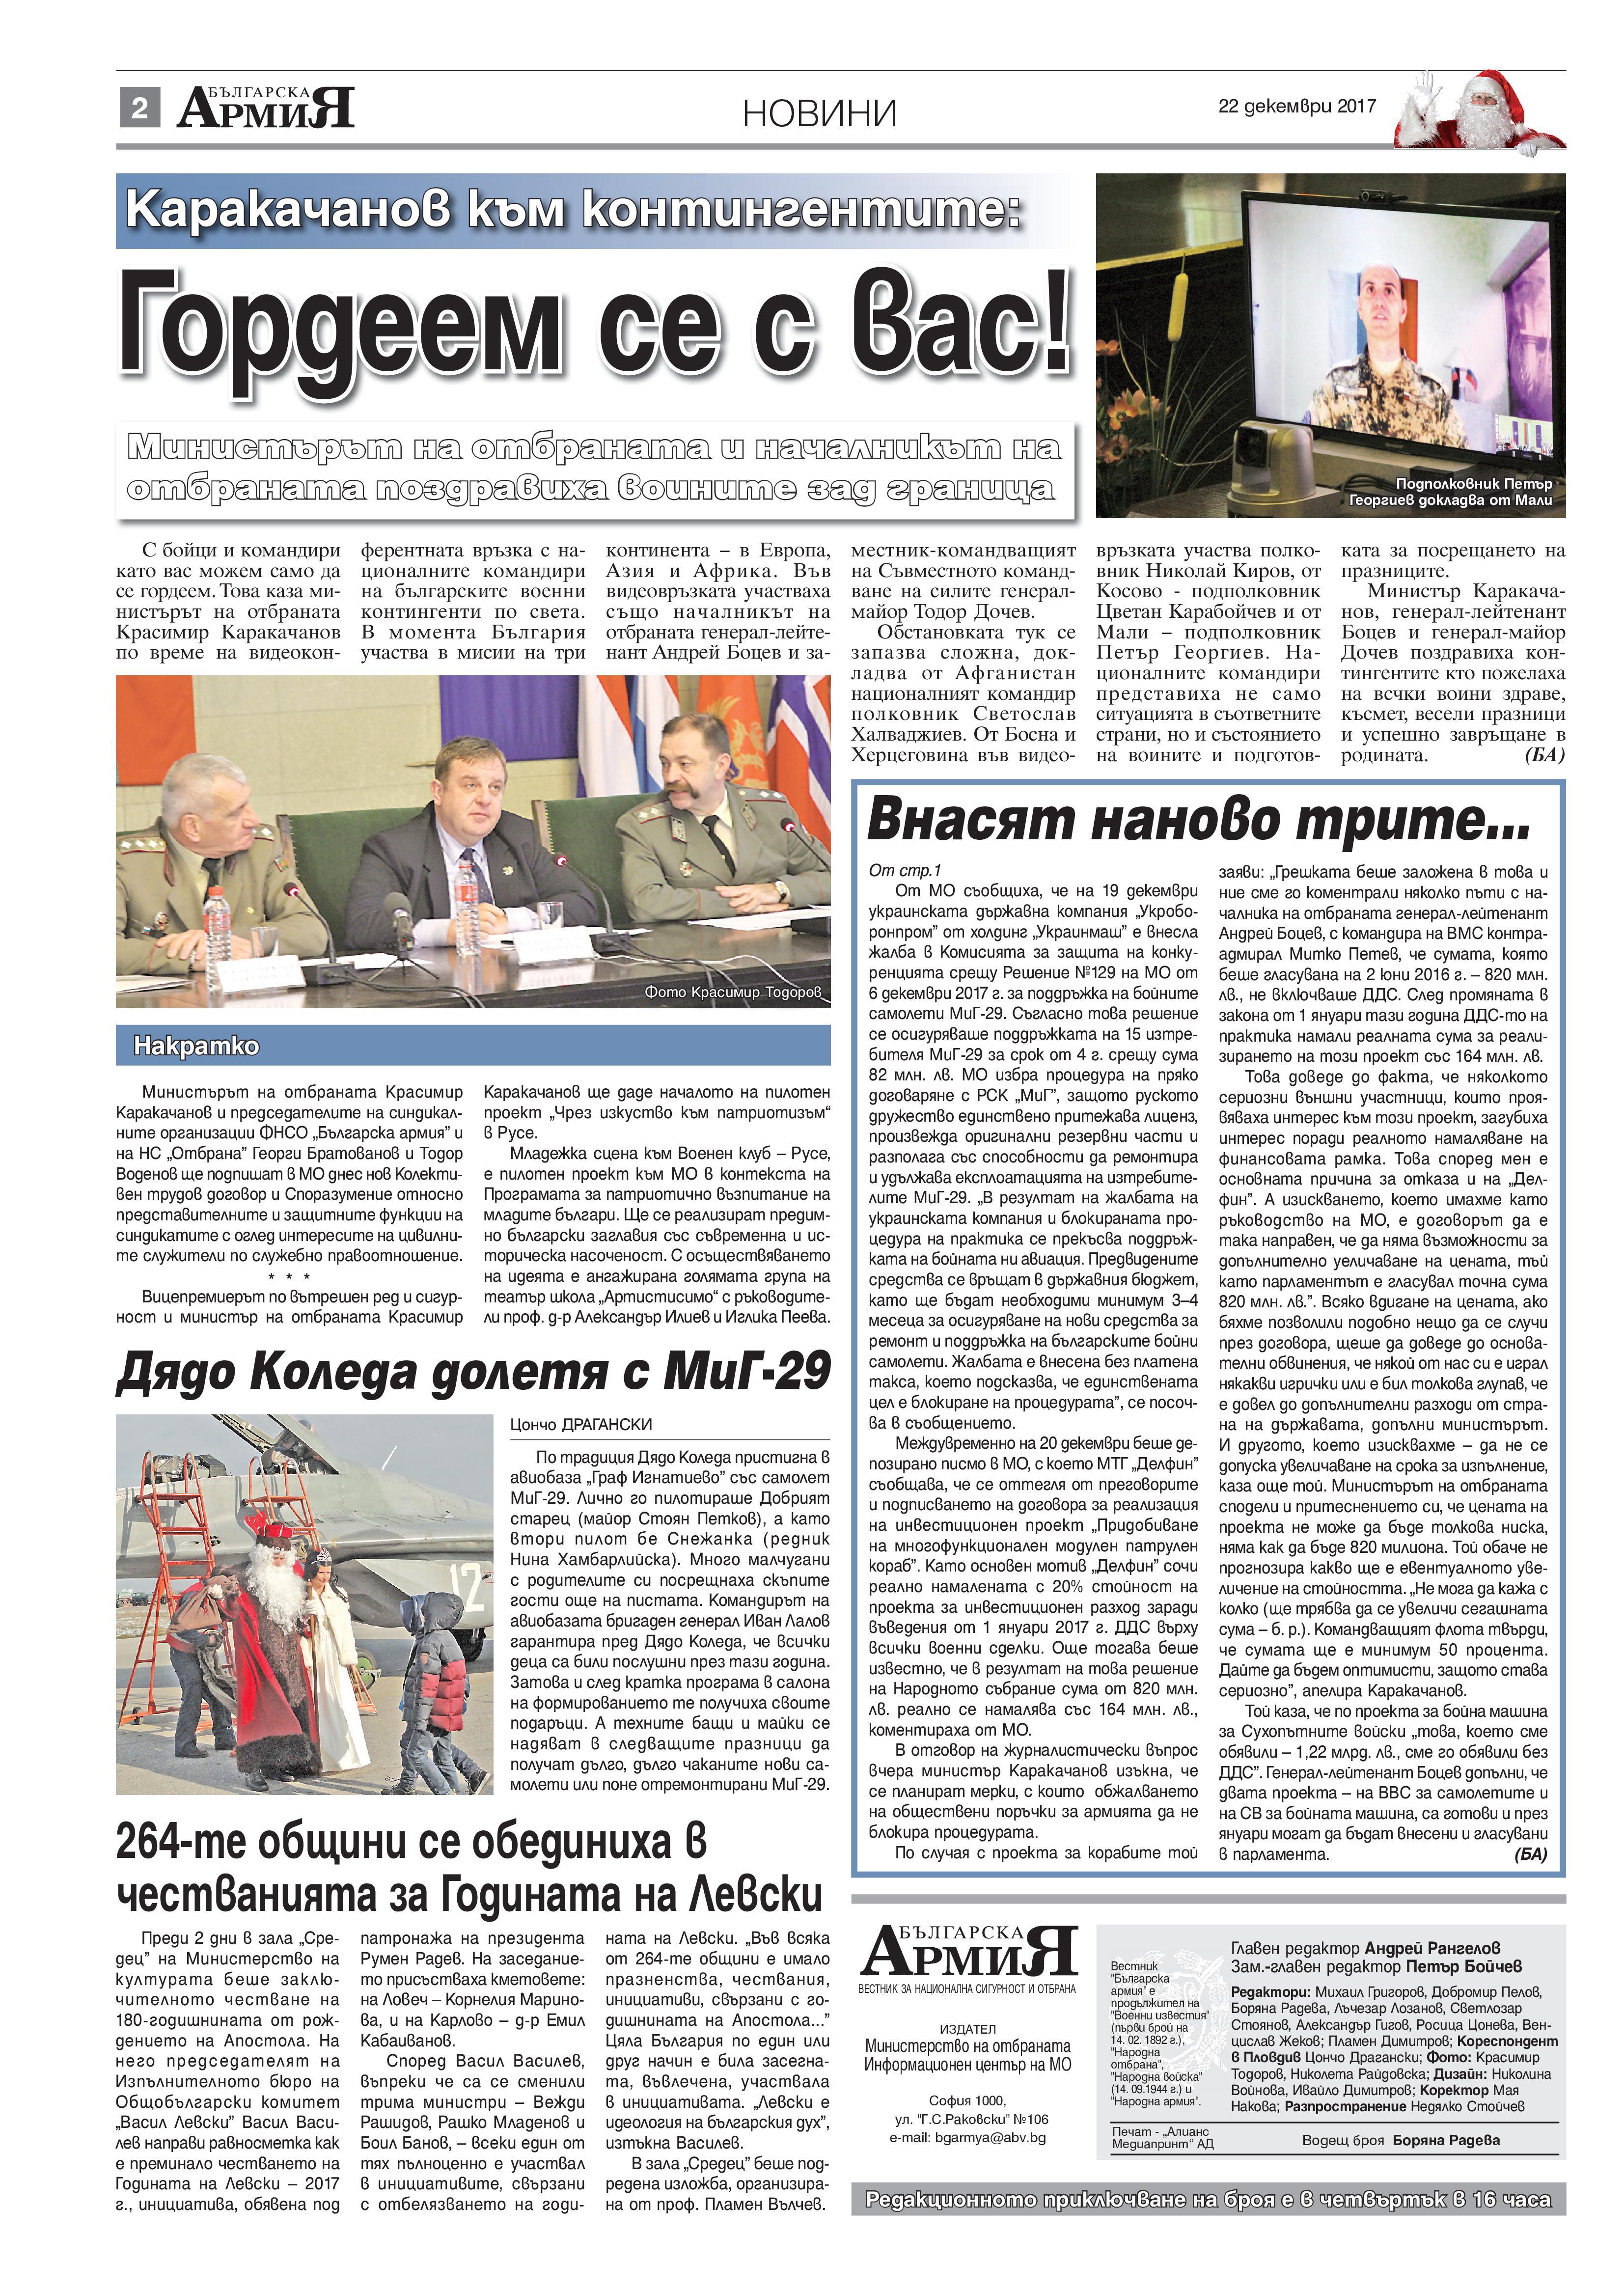 http://armymedia.bg/wp-content/uploads/2015/06/02-15.jpg